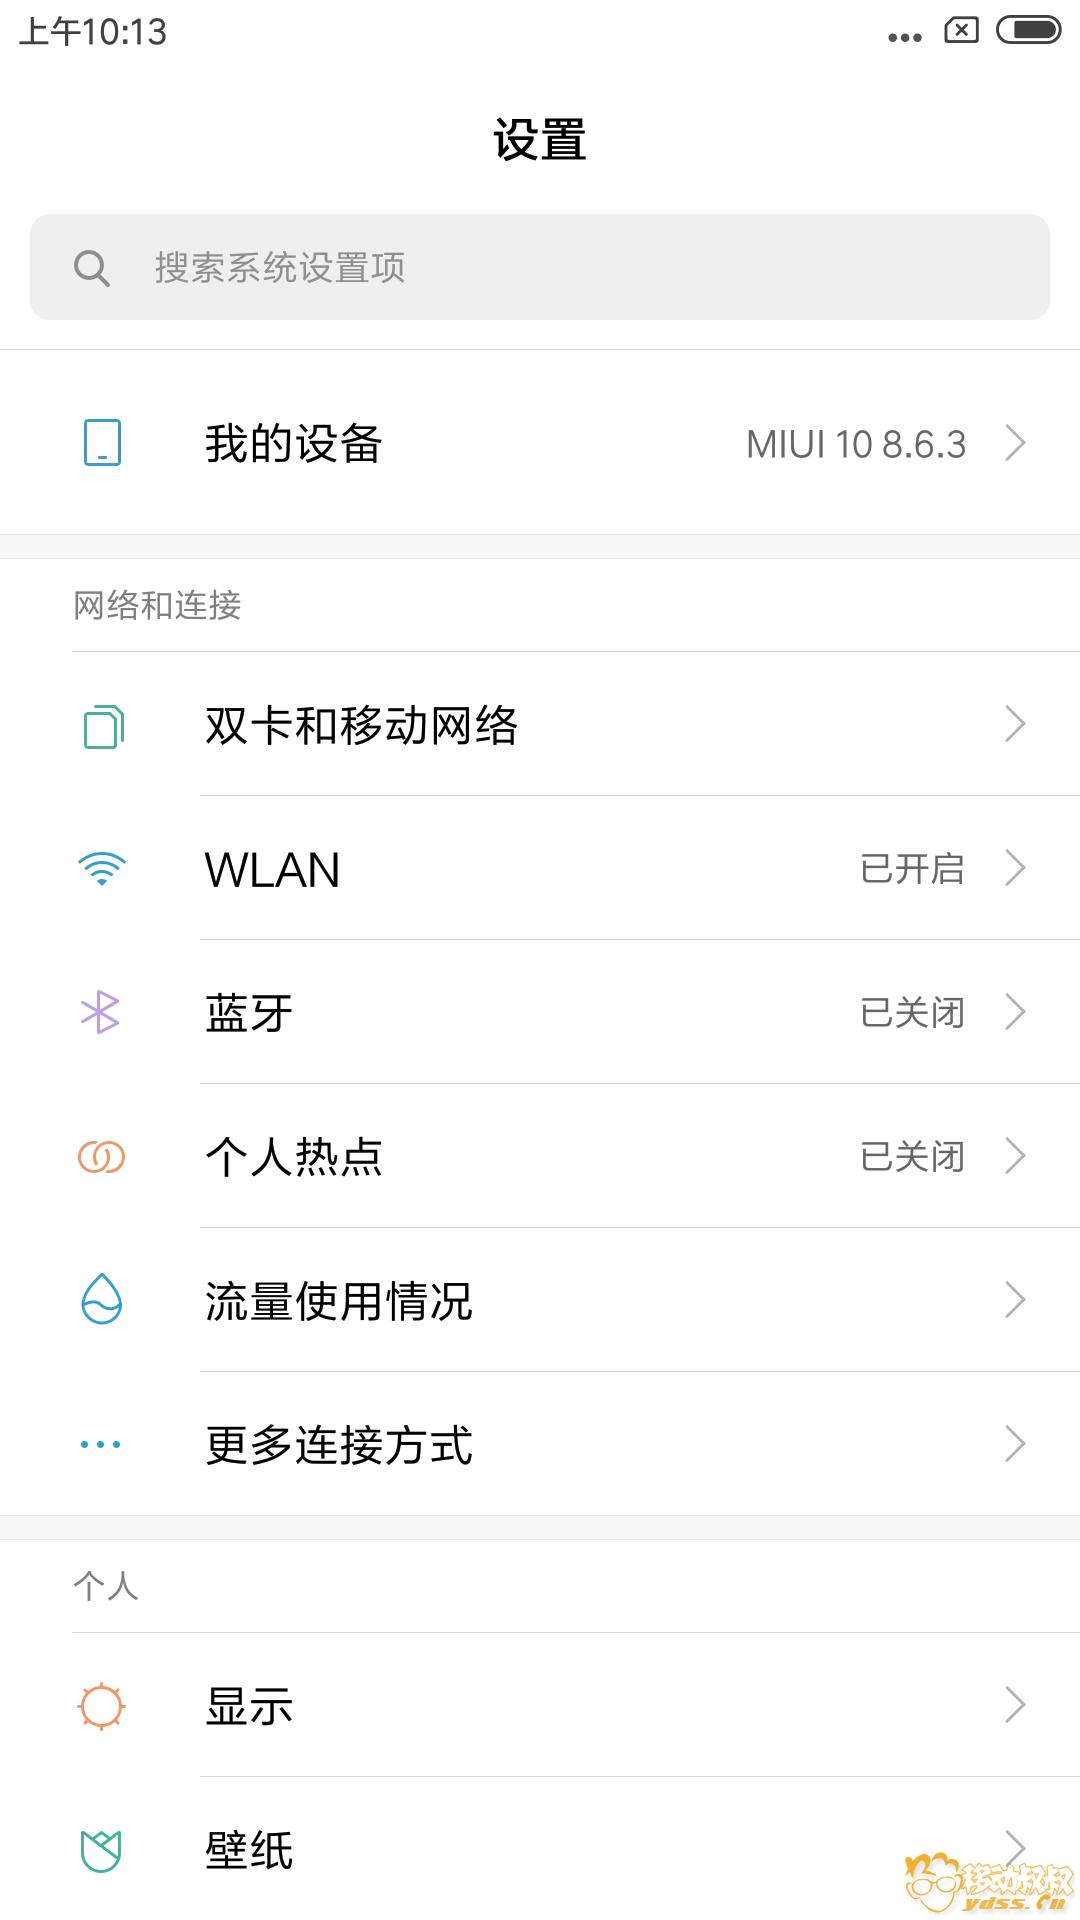 Screenshot_2018-06-03-10-13-06-195_com.android.settings.png